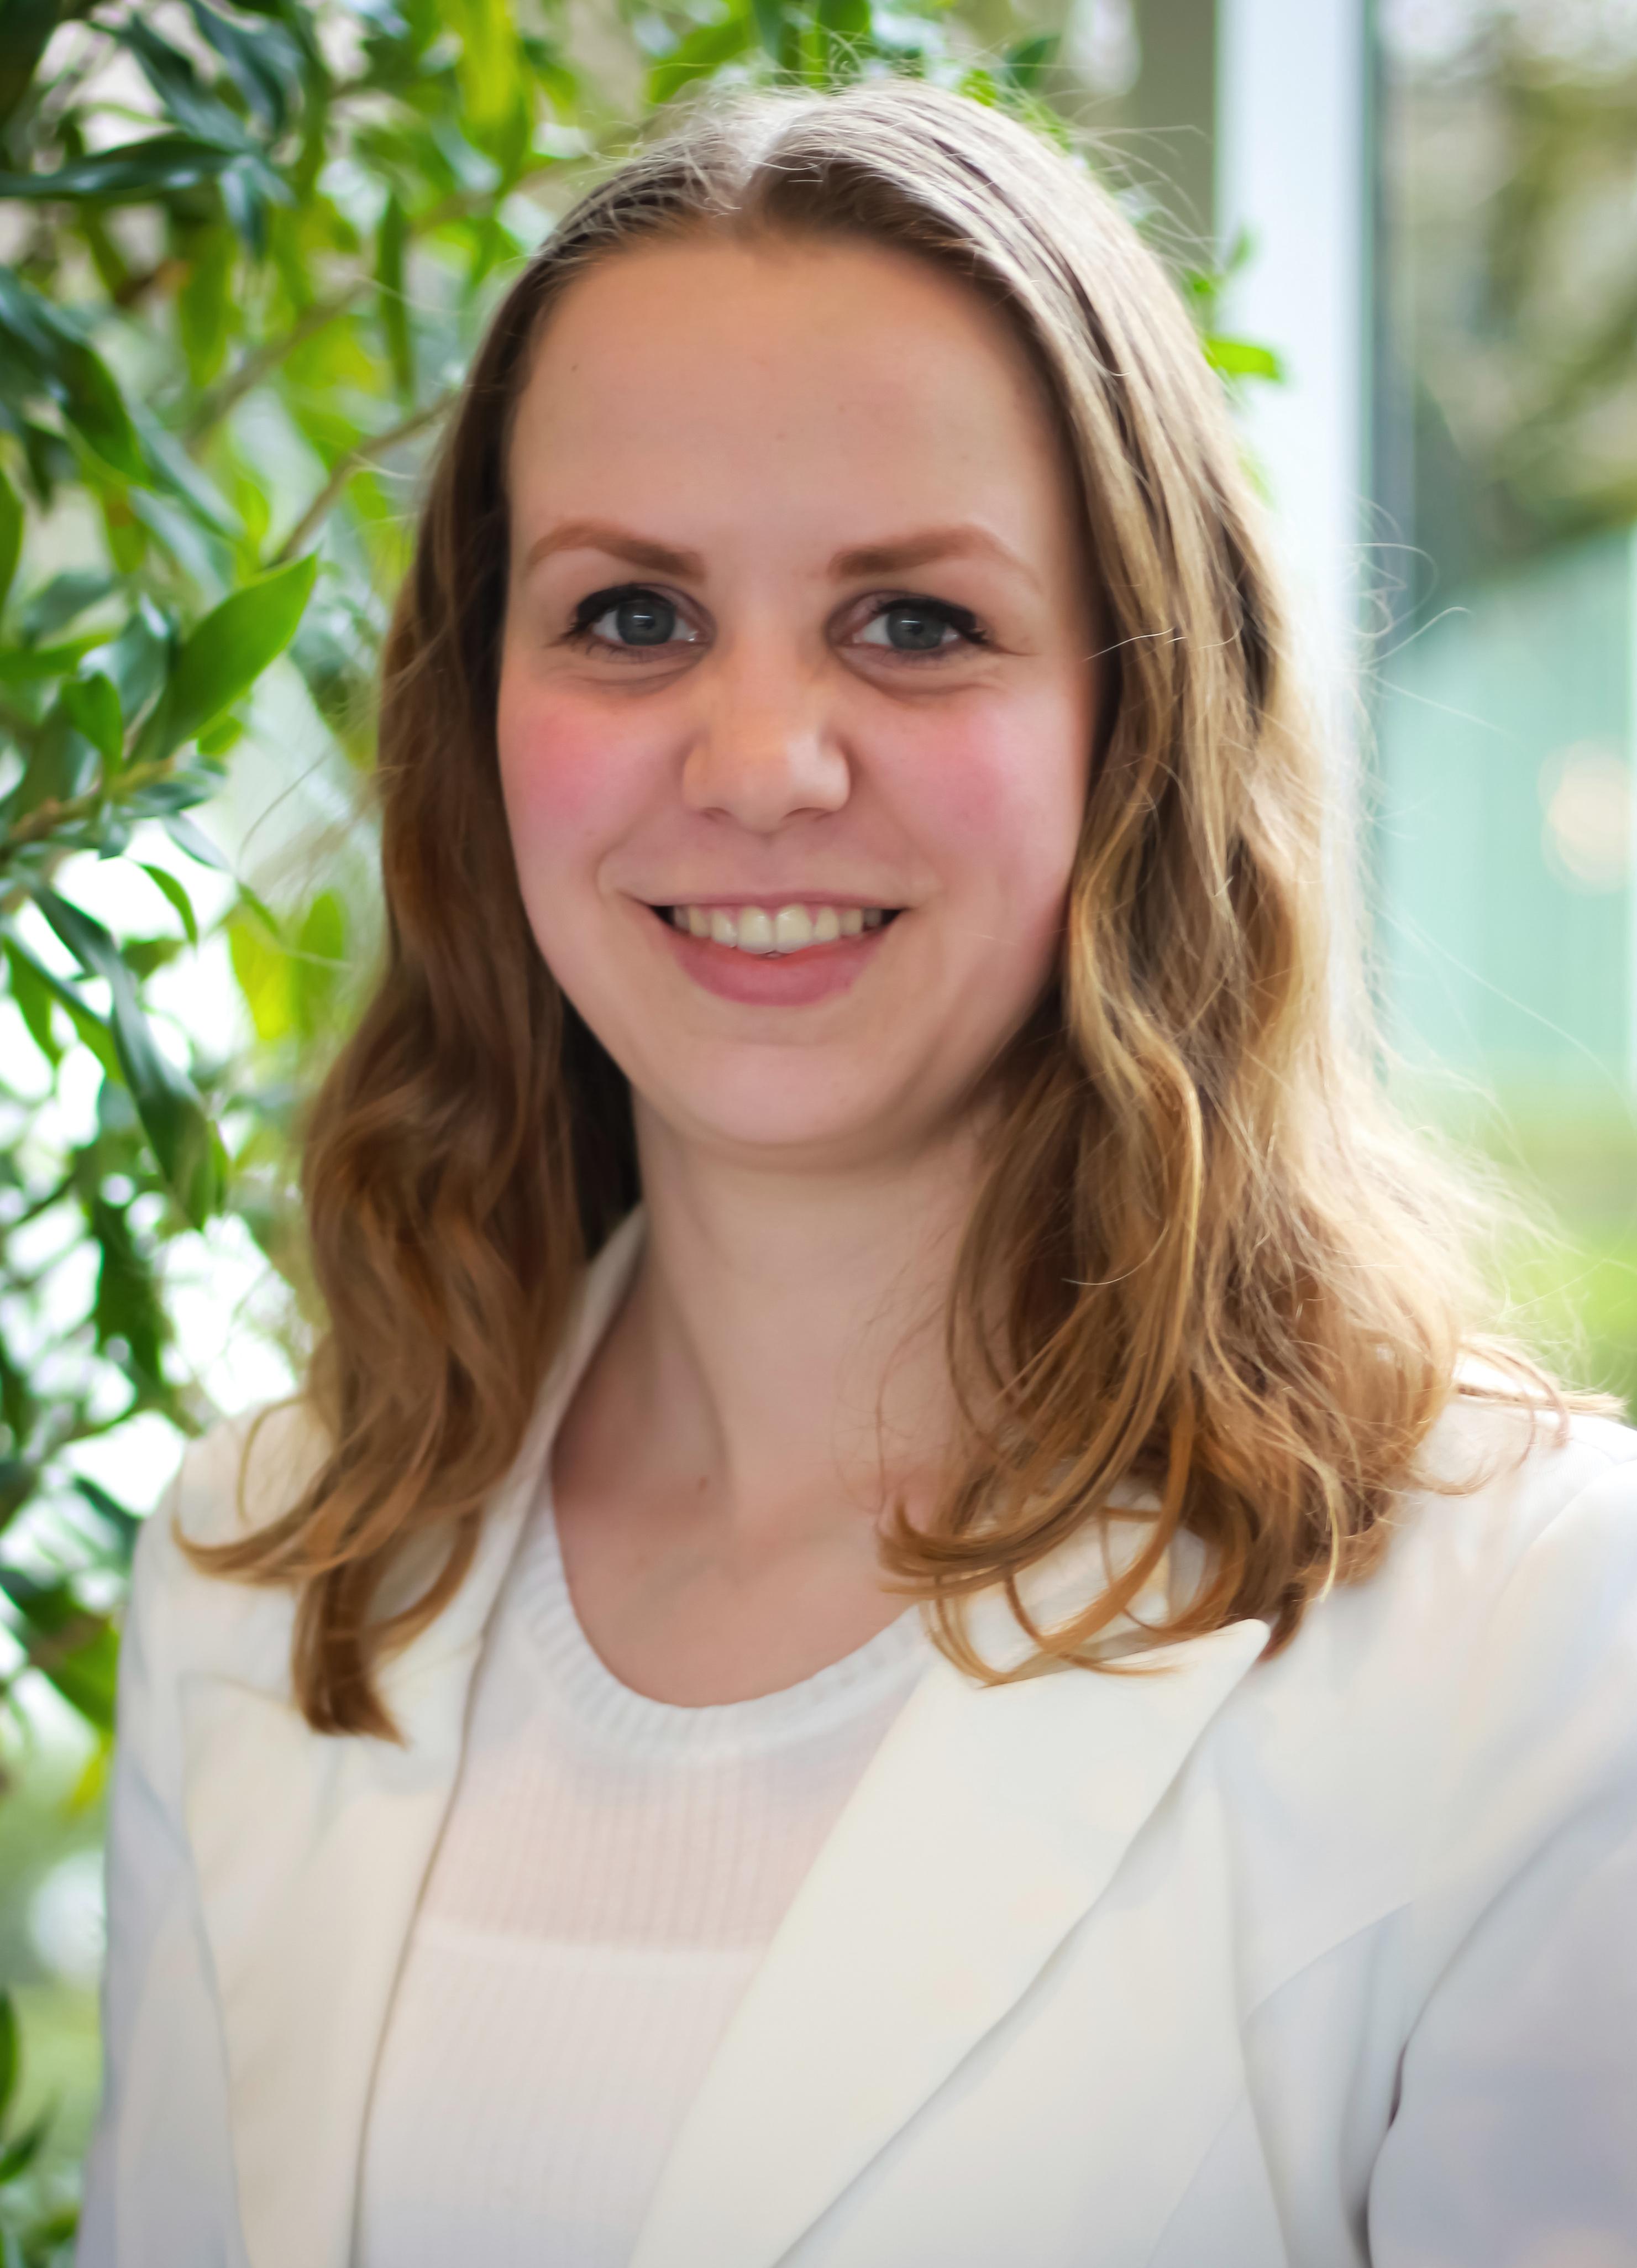 Odette van Spaandonk